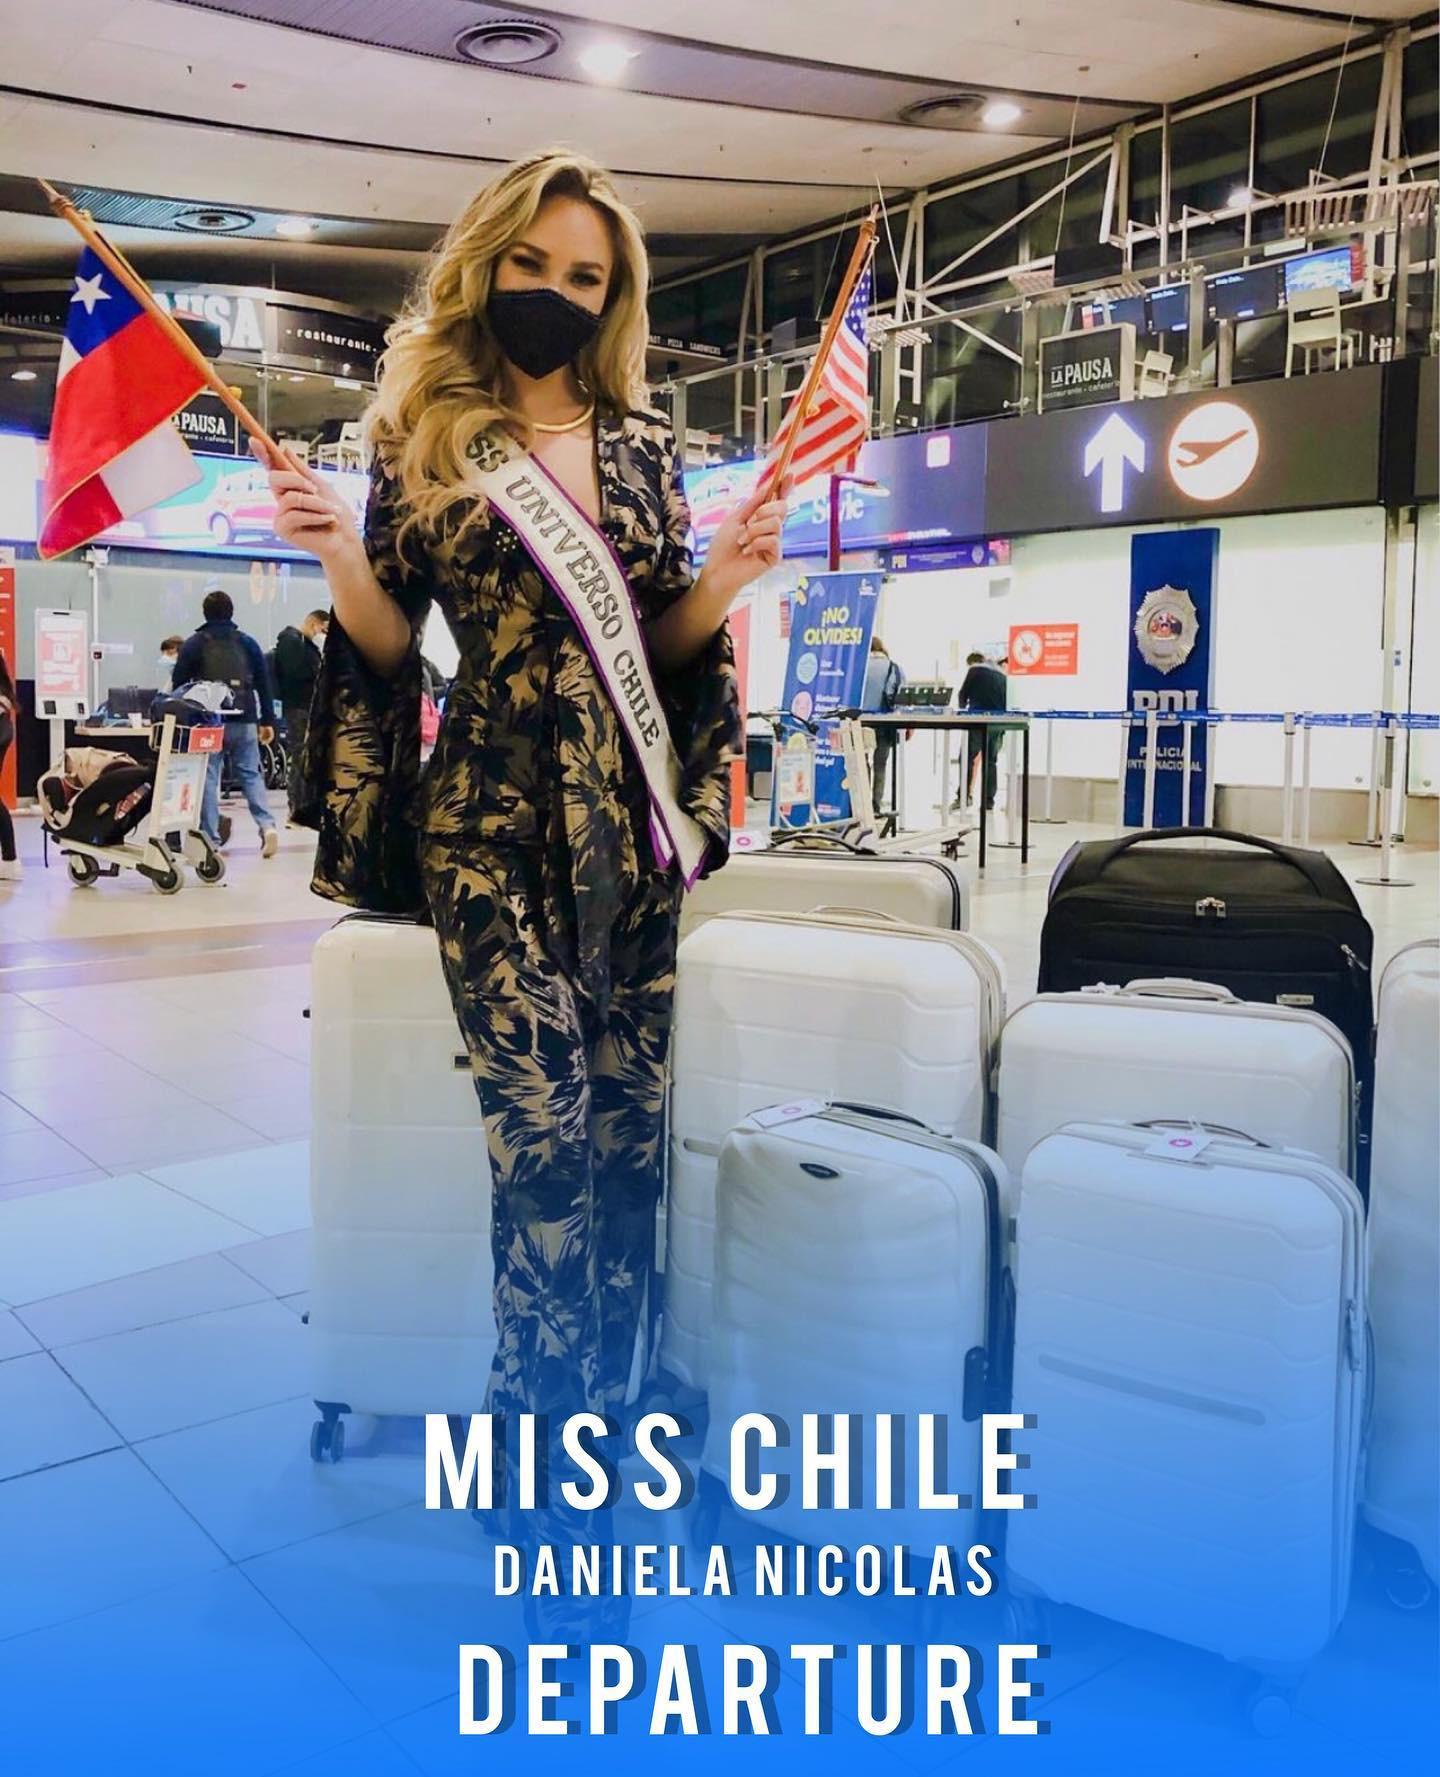 daniela nicolas, miss chile universo 2020. - Página 7 Bxtcfn10